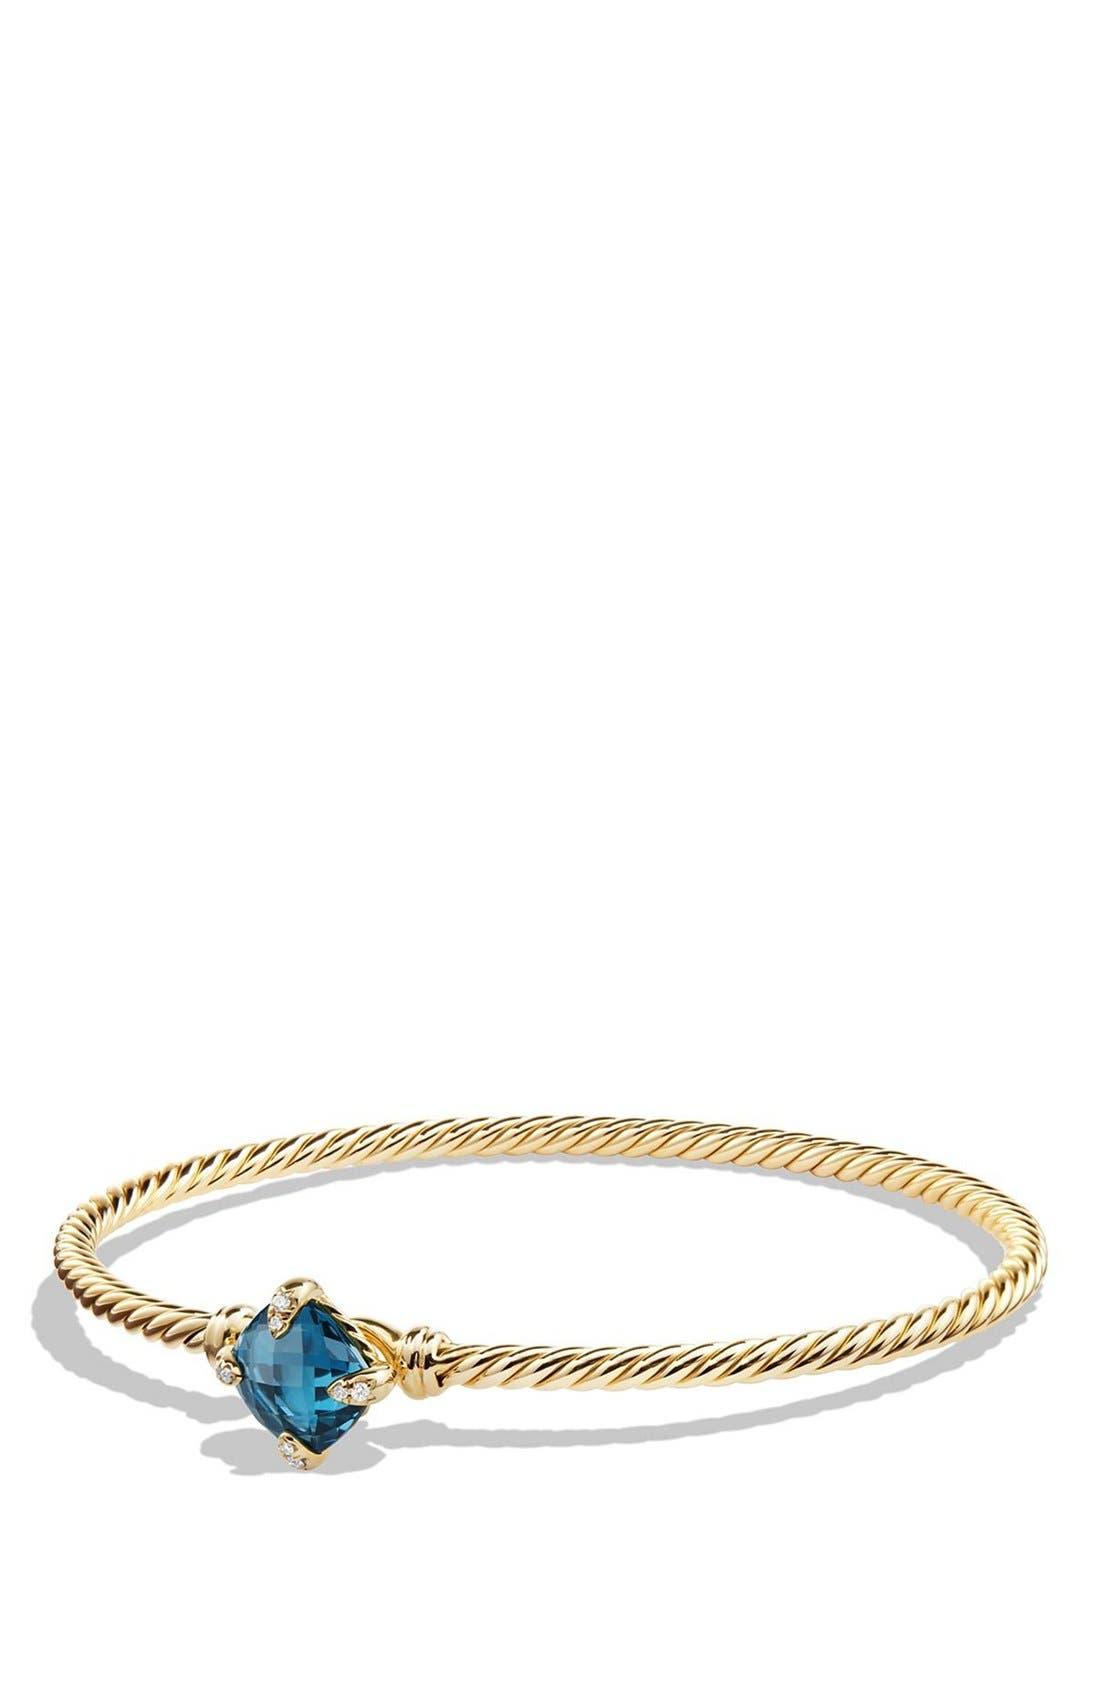 'Châtelaine' Bracelet in 18K Gold with Diamonds,                         Main,                         color, Hampton Blue Topaz